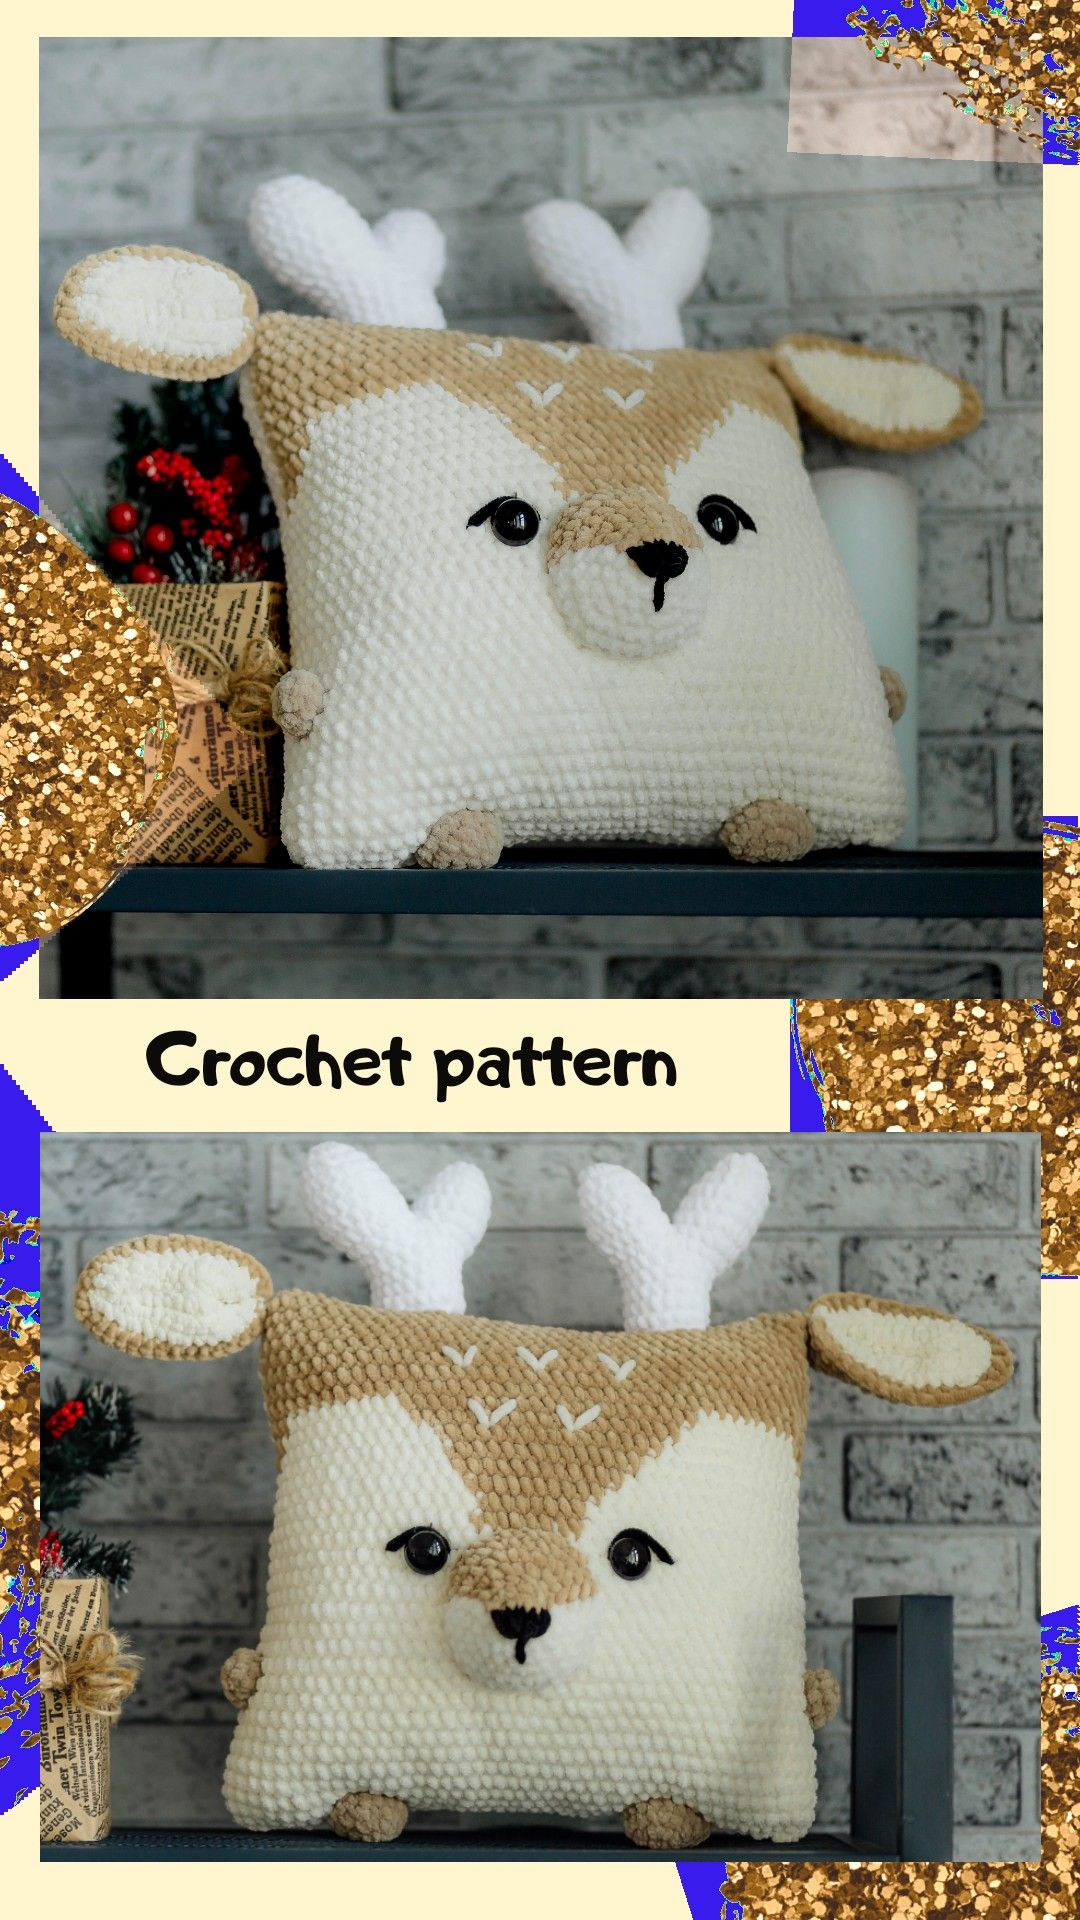 Crochet pattern deer, crochet pillow pattern, crochet raindeer pattern, crochet deer, amigurumi deer